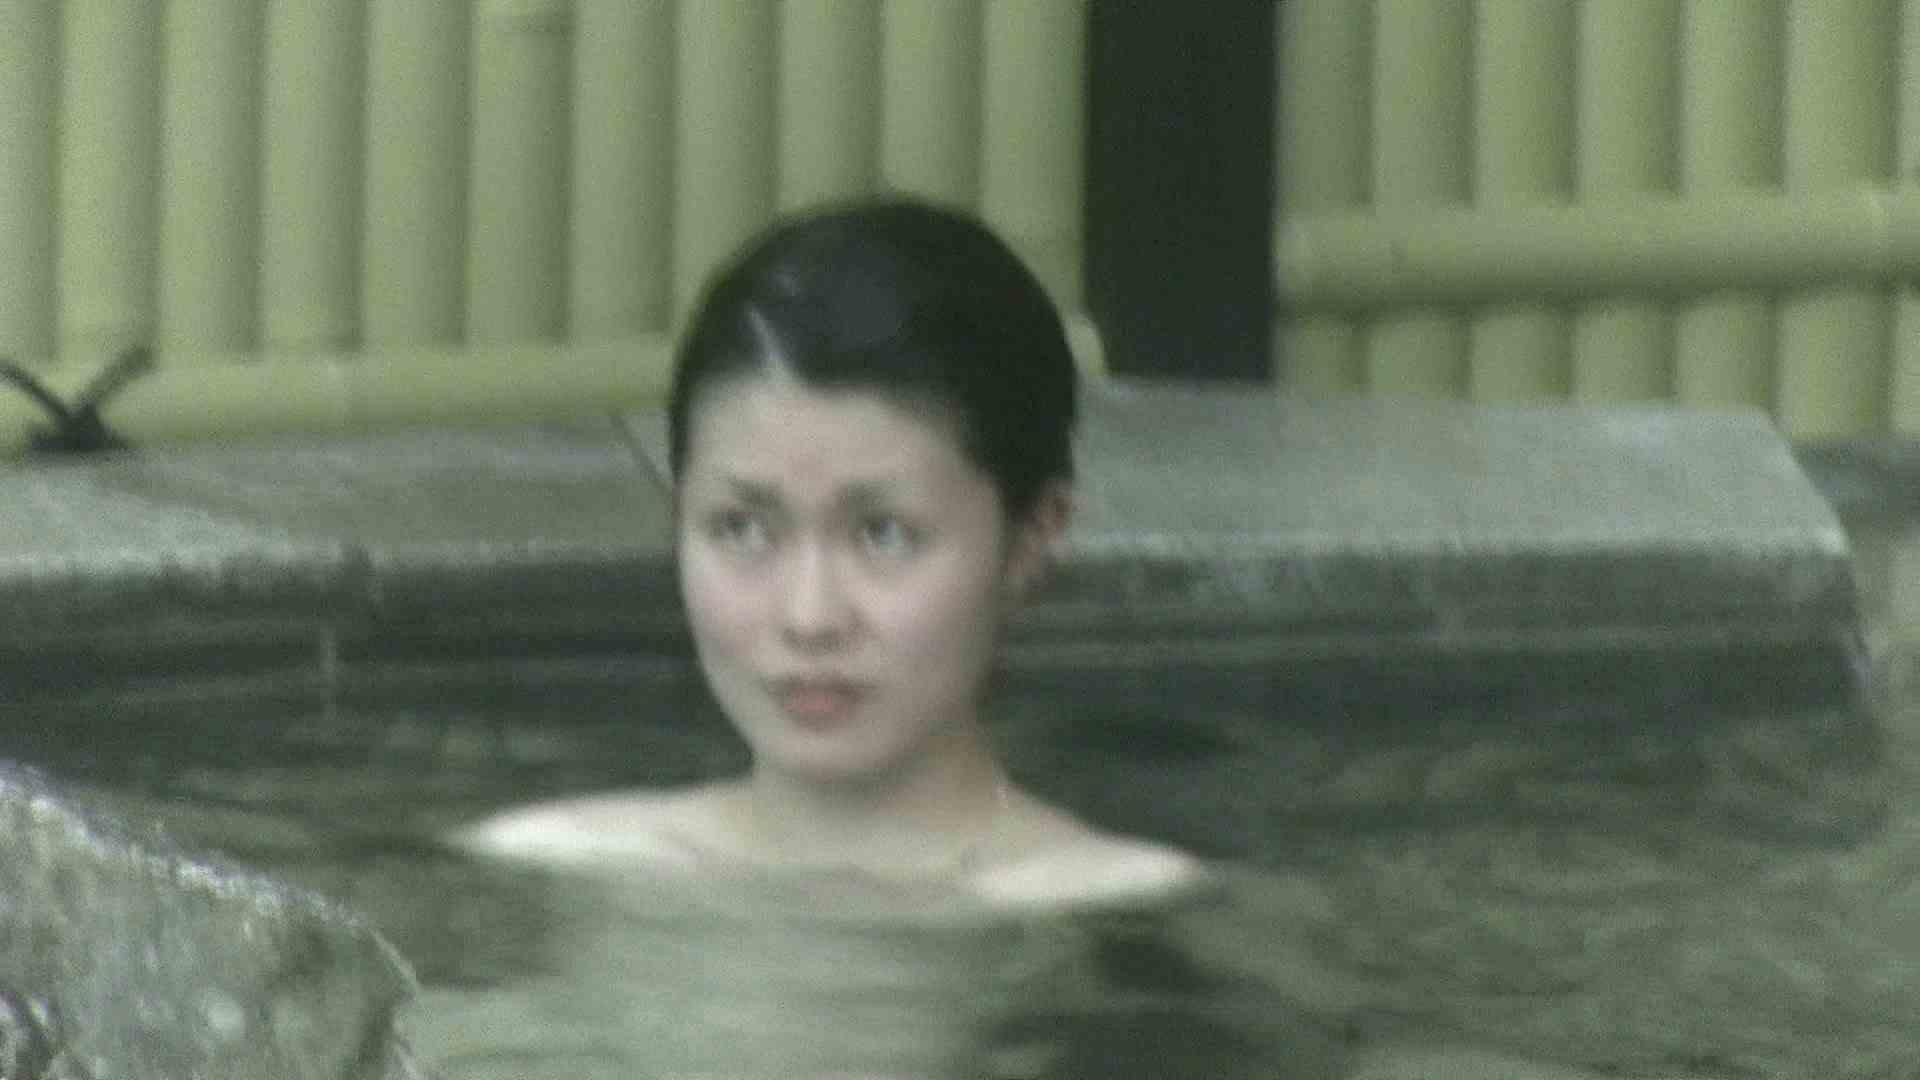 Aquaな露天風呂Vol.194 露天風呂編  110PIX 52